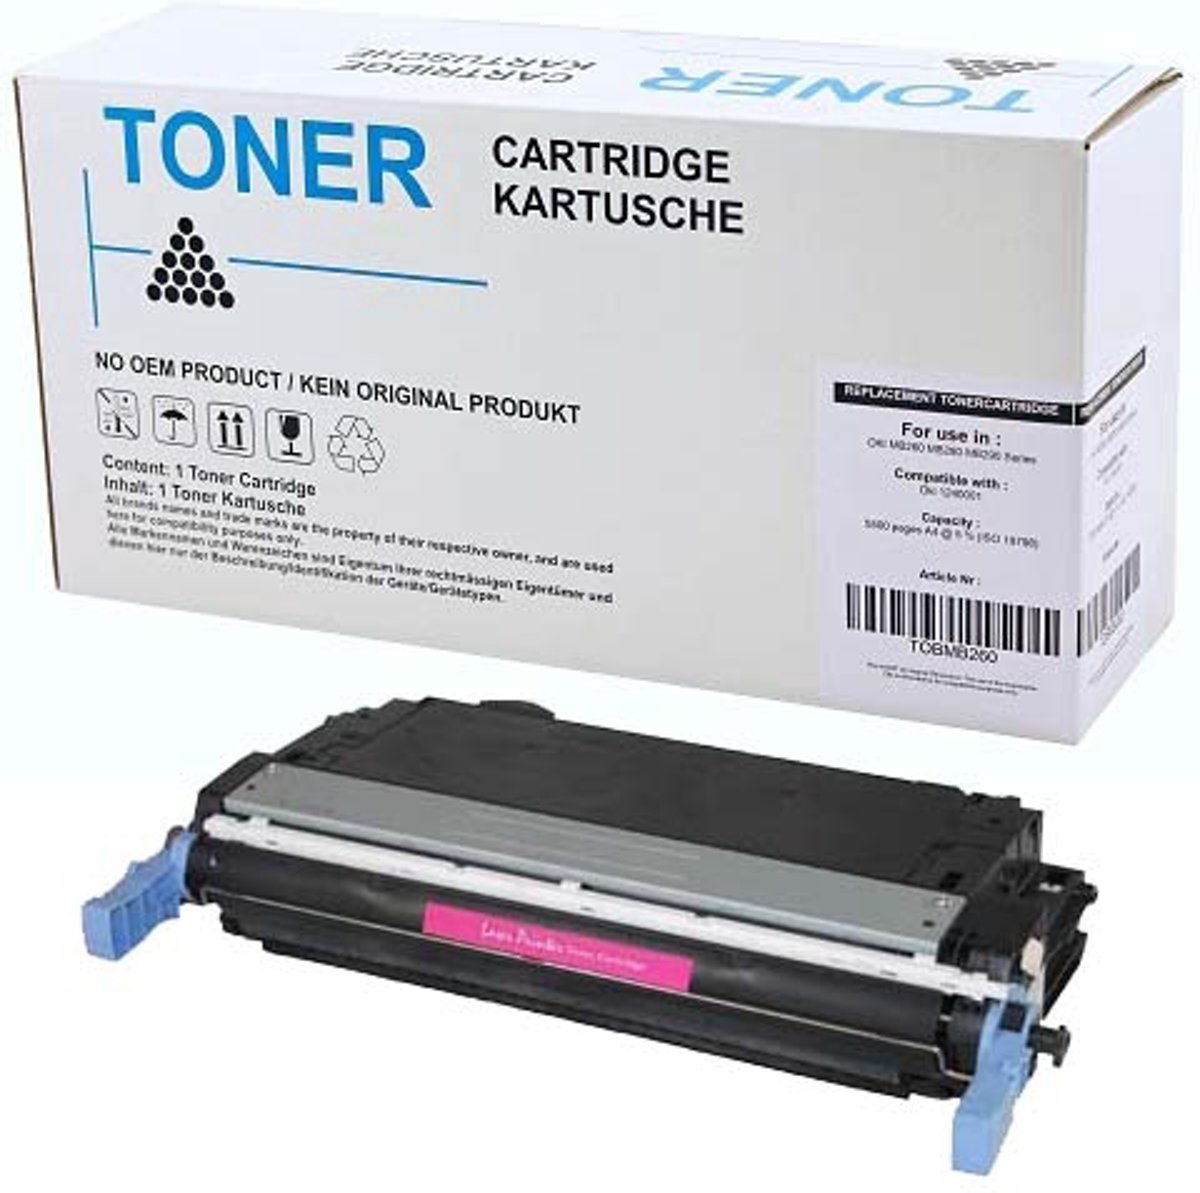 Toner Voor Hp 642a Cb403a Laserjet Cp 4005 Magenta Color Cp4005 Cyan Cartridge Cb401a